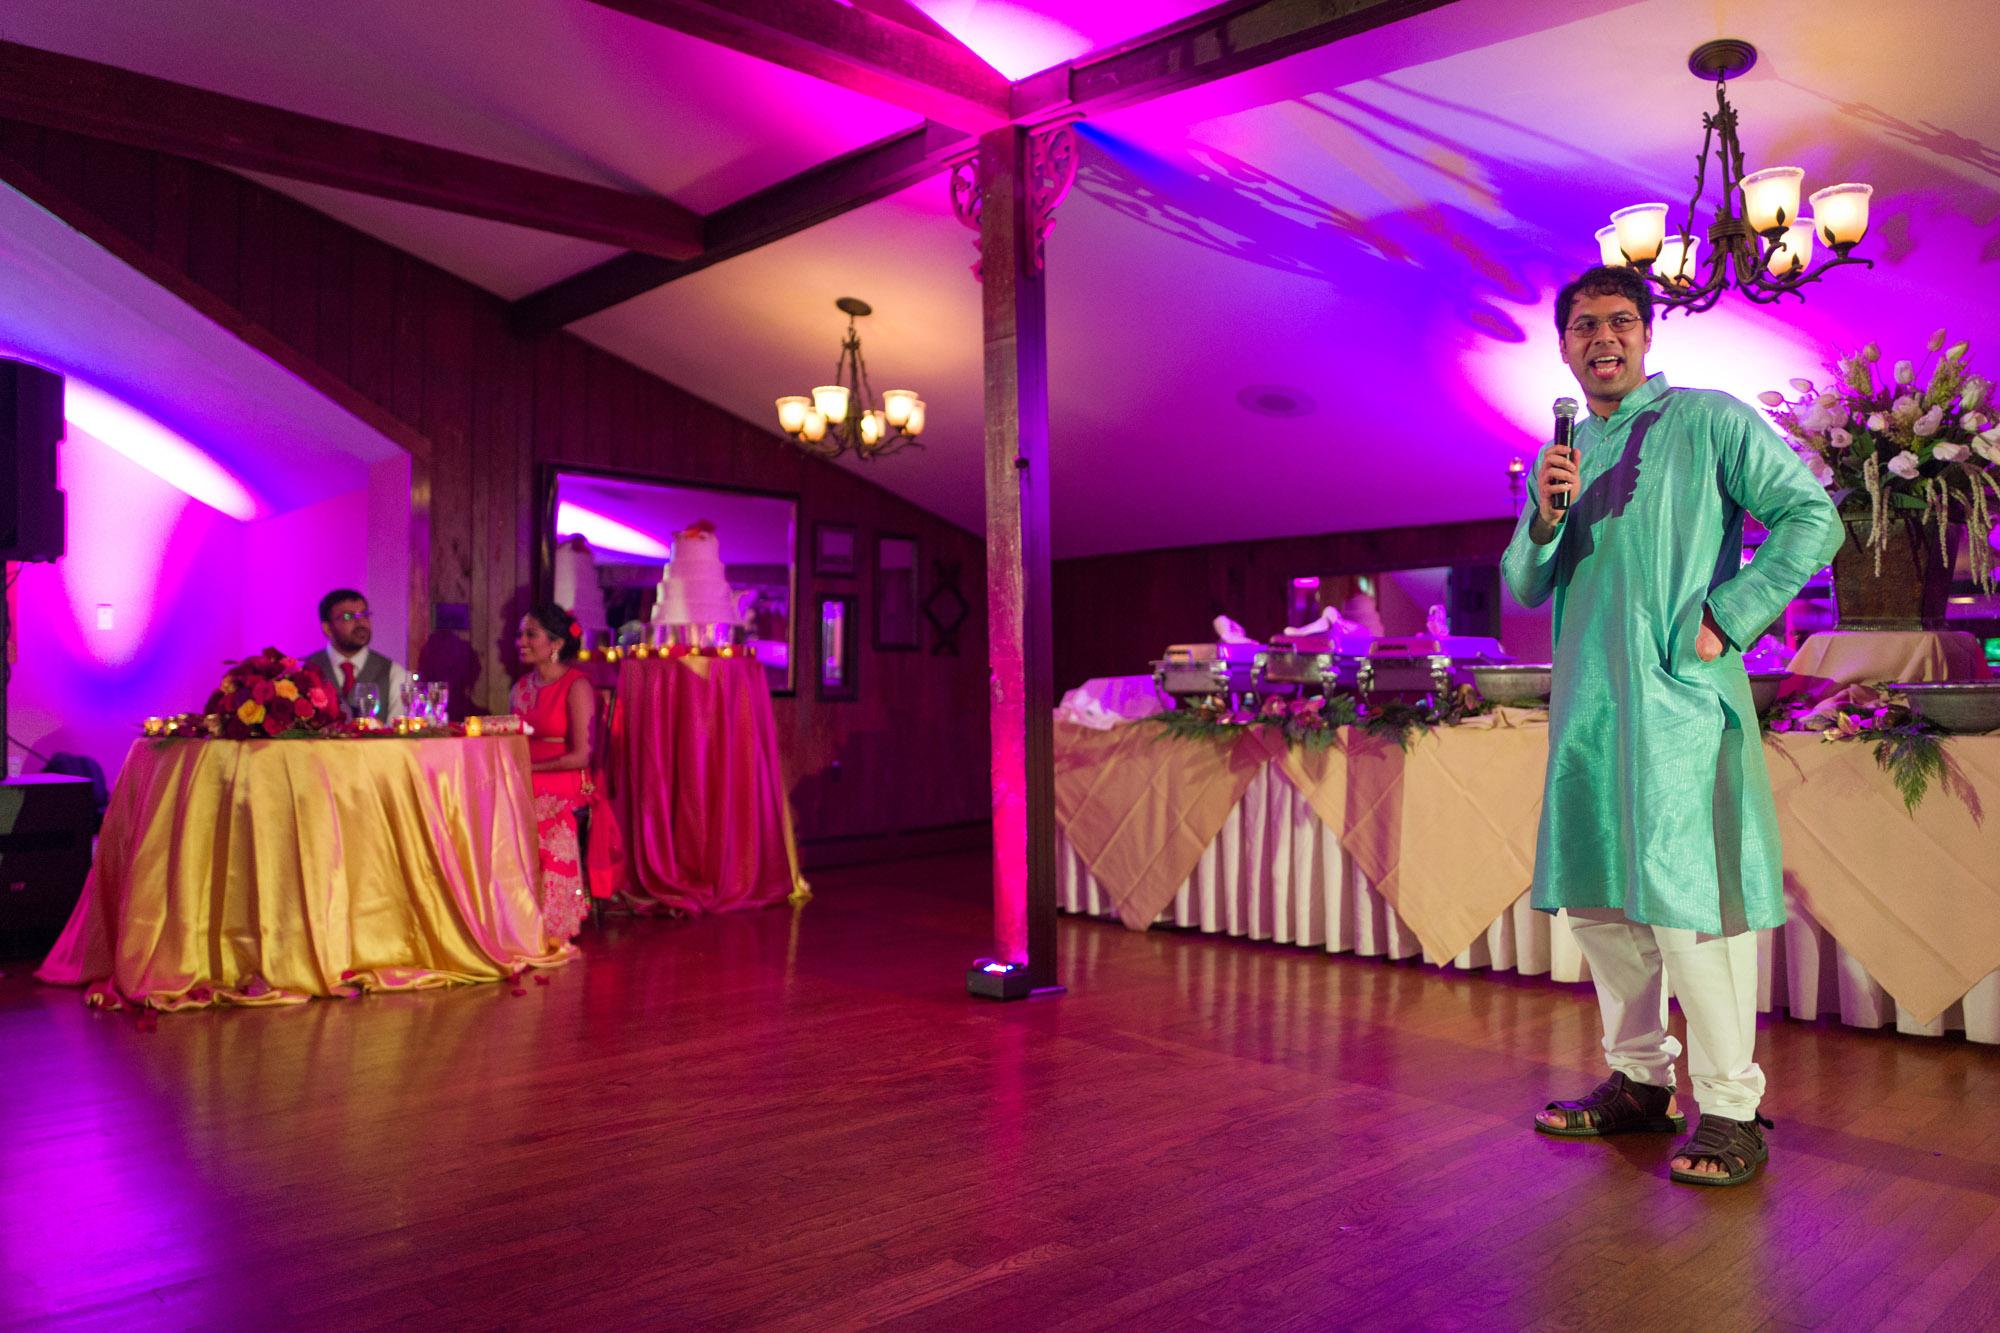 malika & nadir woodsgate stroudsmoor wedding 71